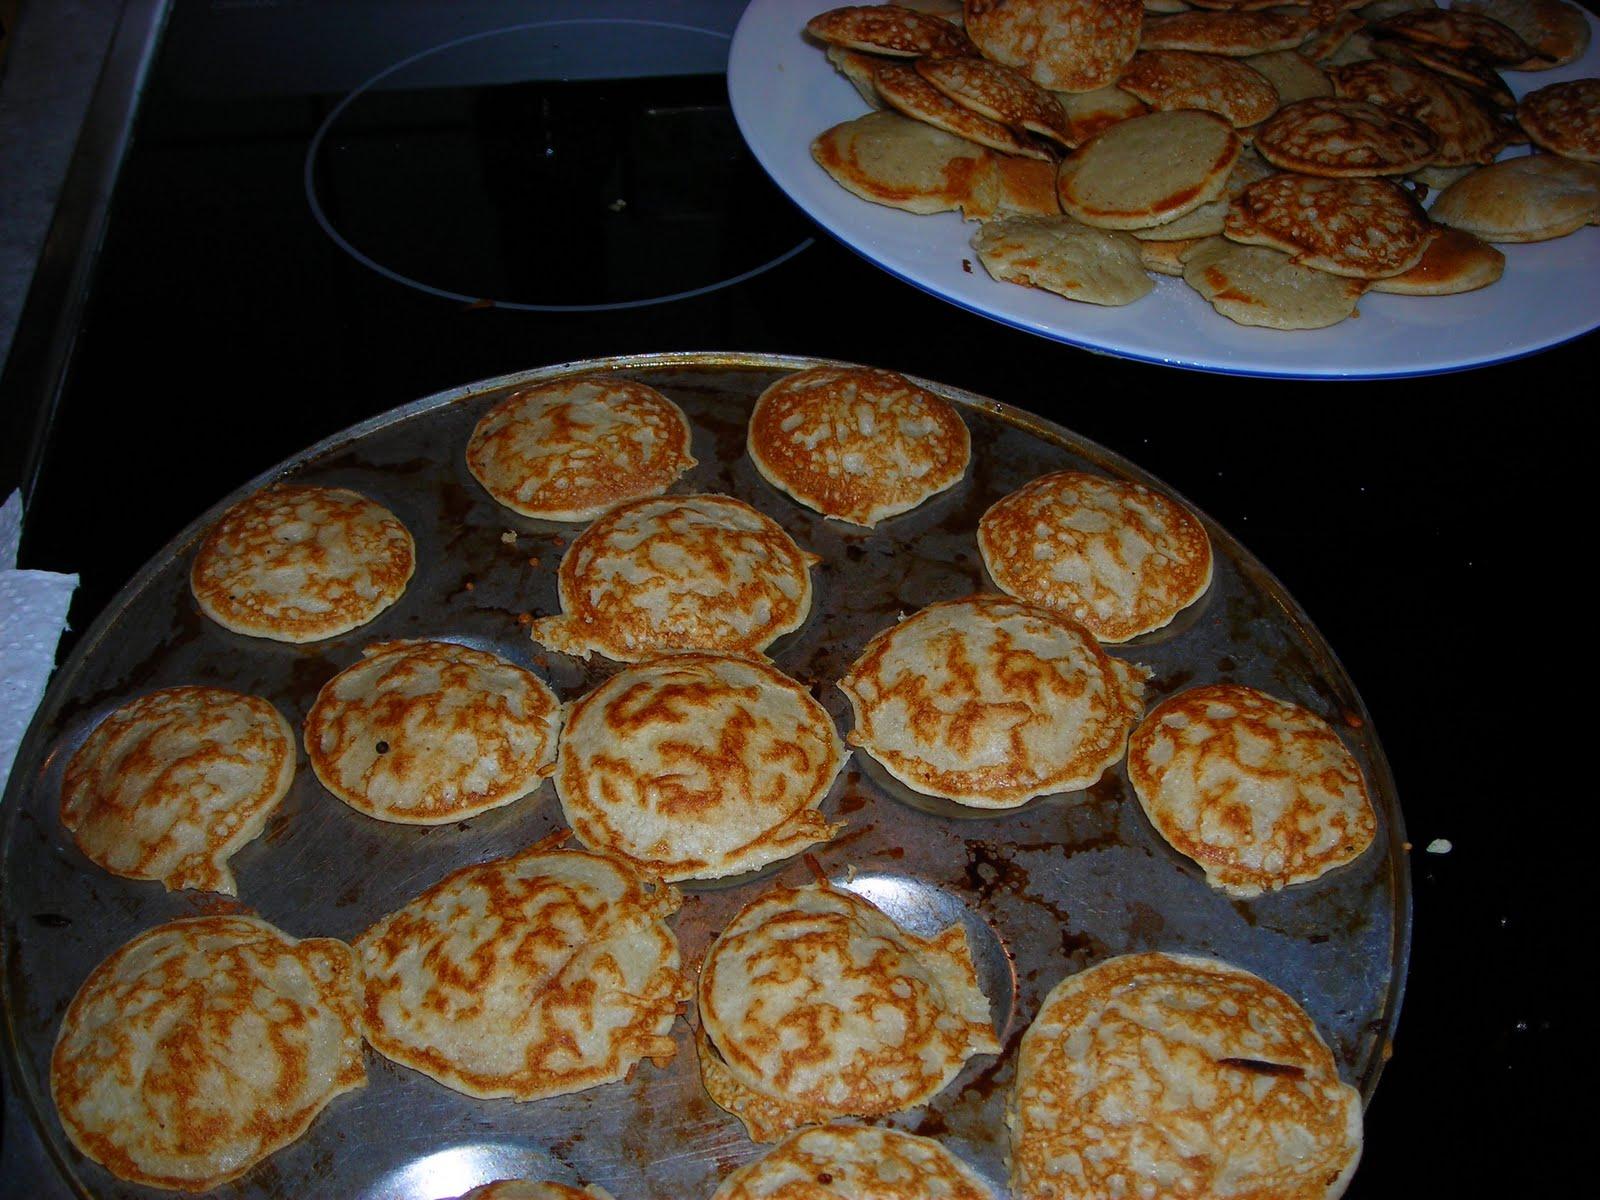 Toni S Pastries Poffertjes